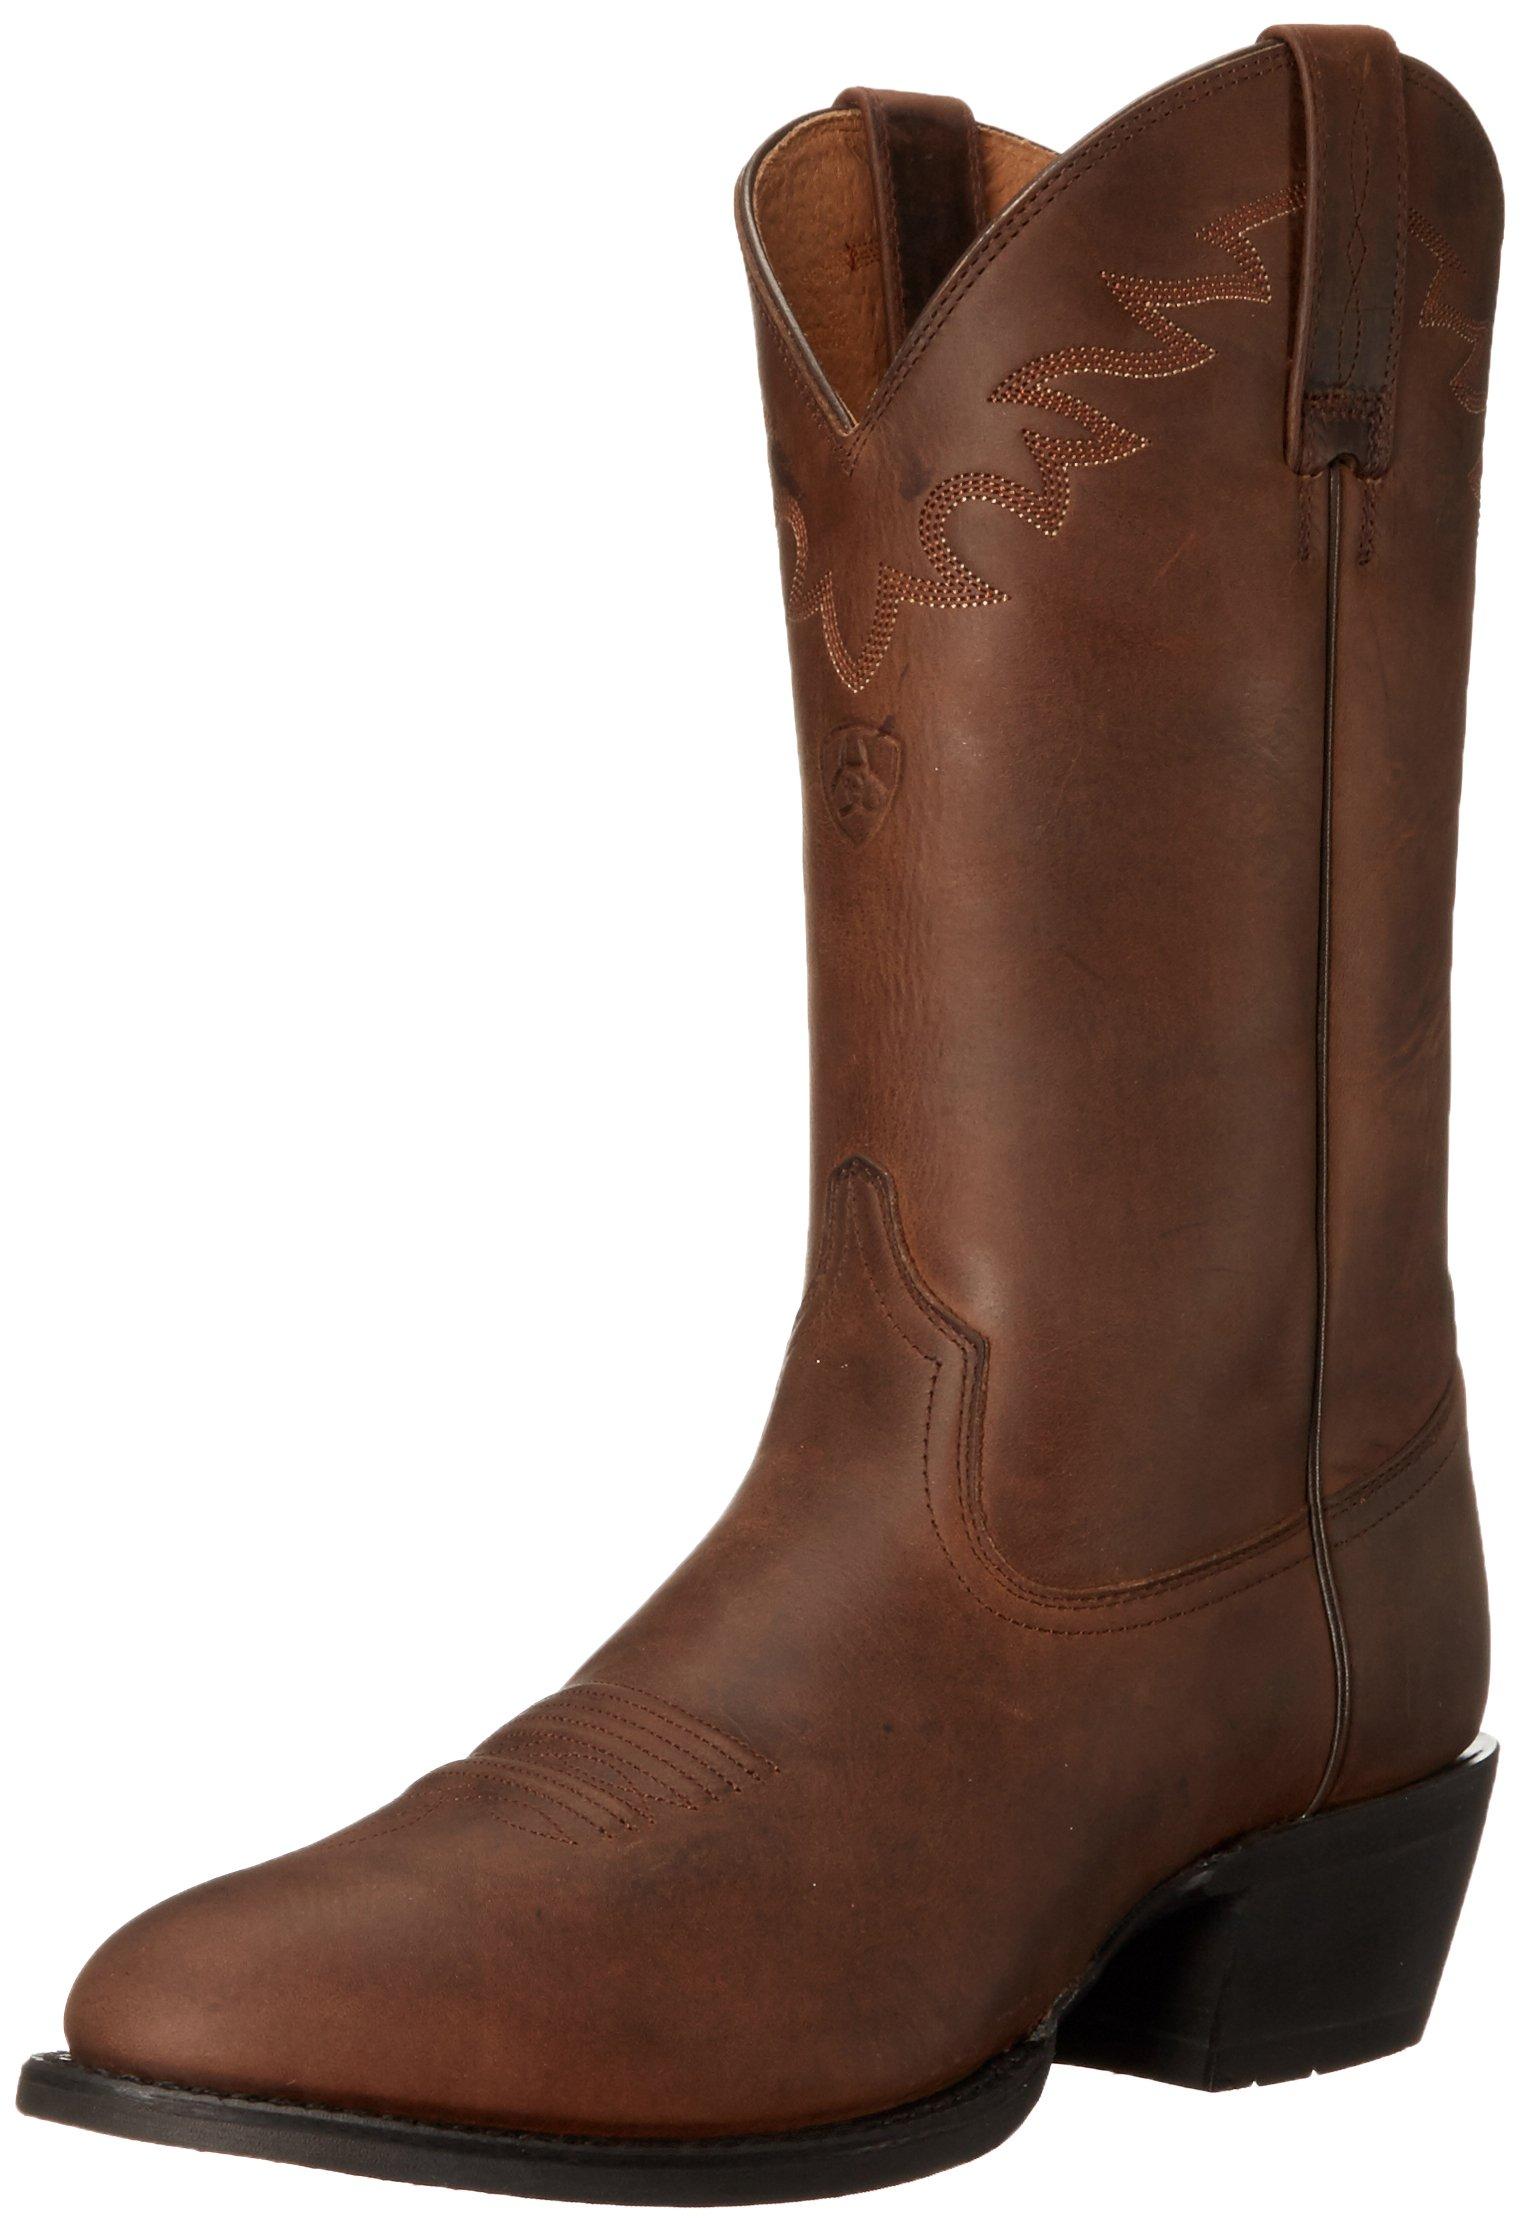 Ariat Men's Sedona Western Cowboy Boot, Distressed Brown, 12 M US